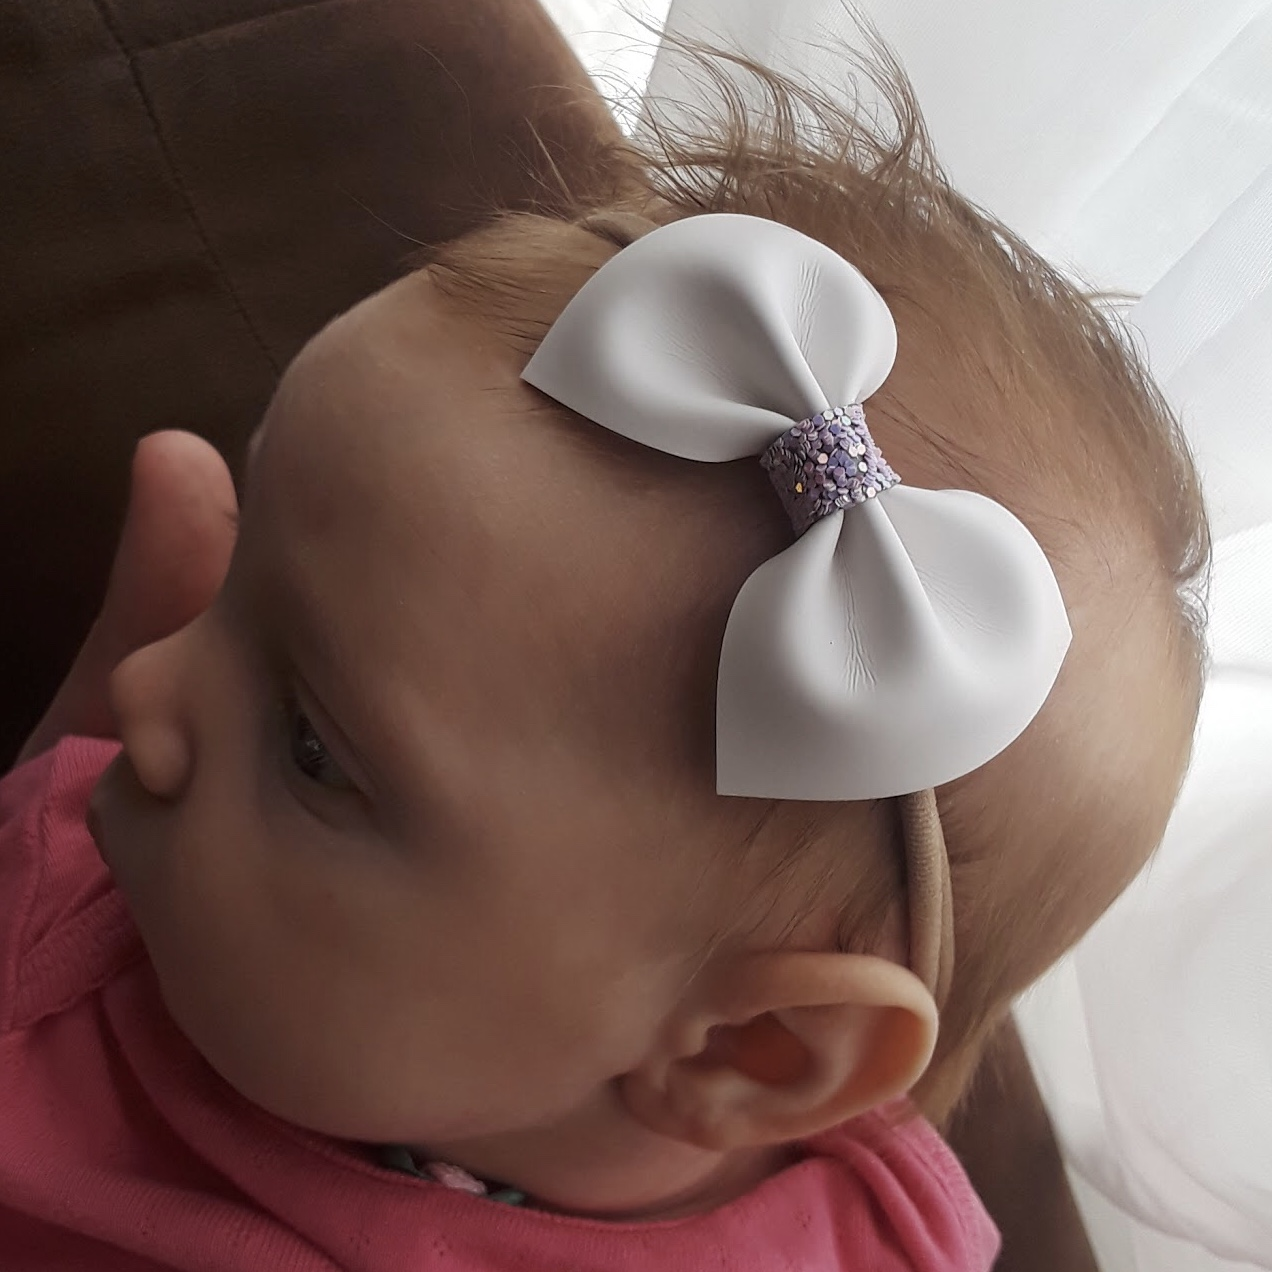 Teal Bow Baby Bow Headband Newborn Headband -Baby Girl Headband Baby Headband Nylon Headband-Hair Bow Light Teal Baby Headband